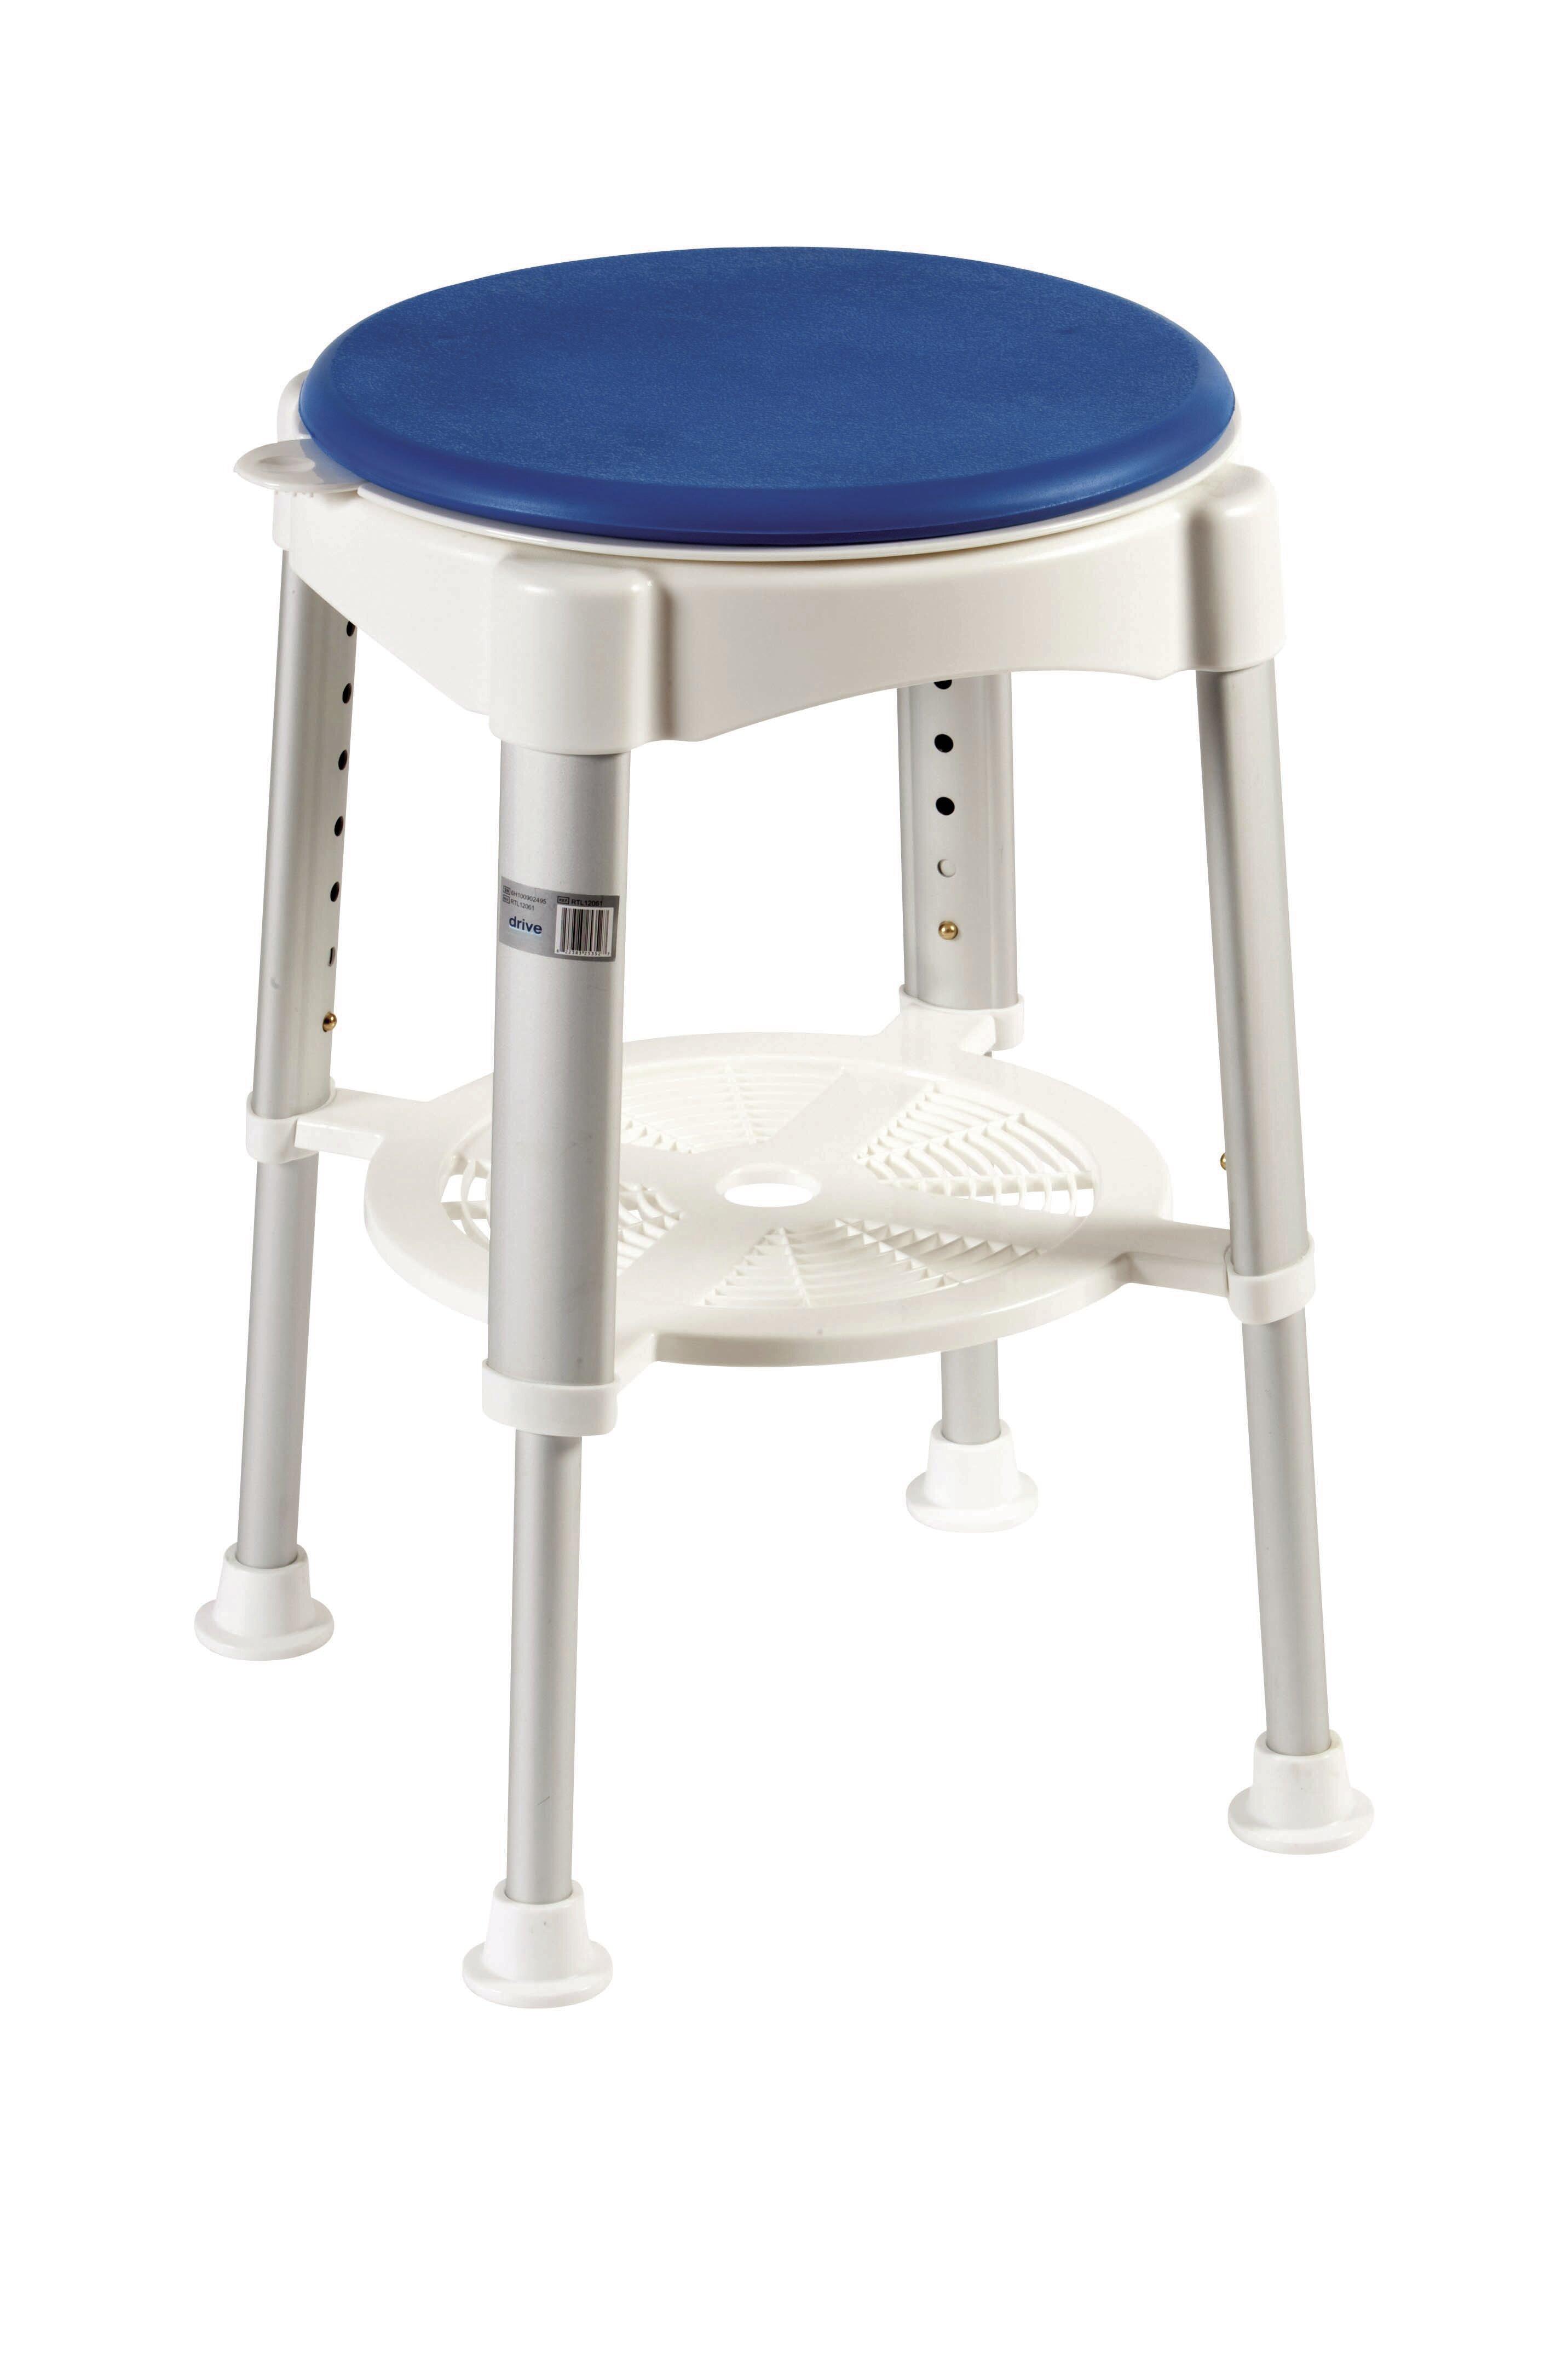 Drive Medical Rotating Shower Chair | Wayfair.co.uk